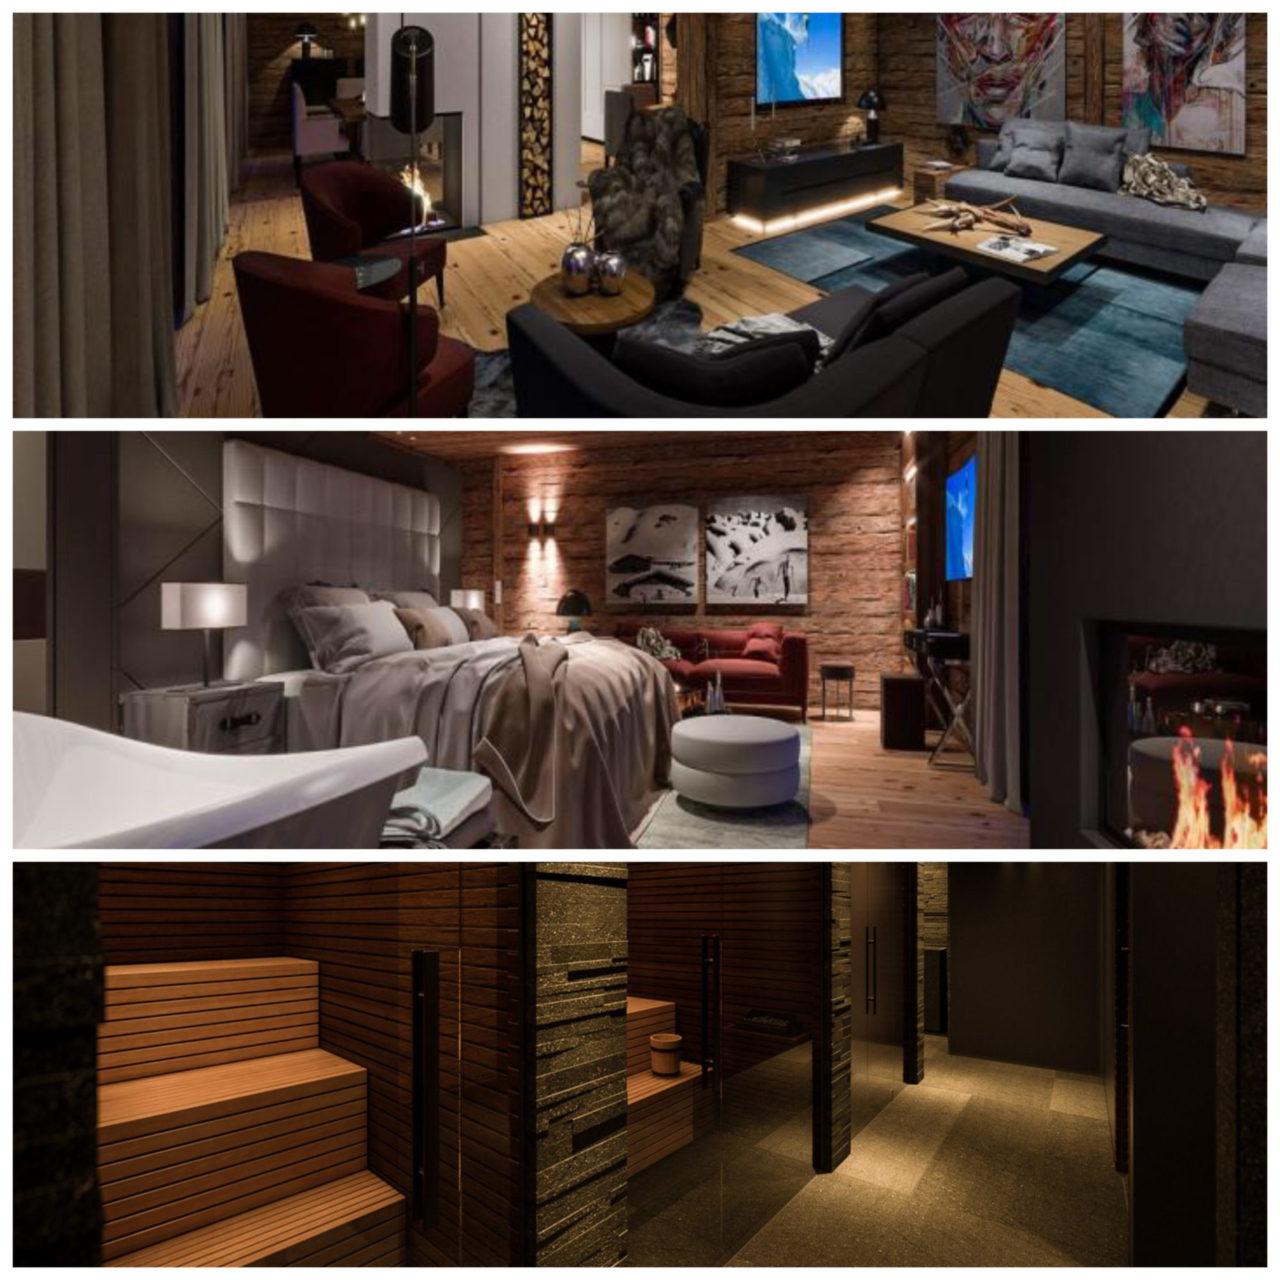 www.finest-holidays.com SEVERIN*S - The Alpine Retreat, suite, bedroom, living, sauna